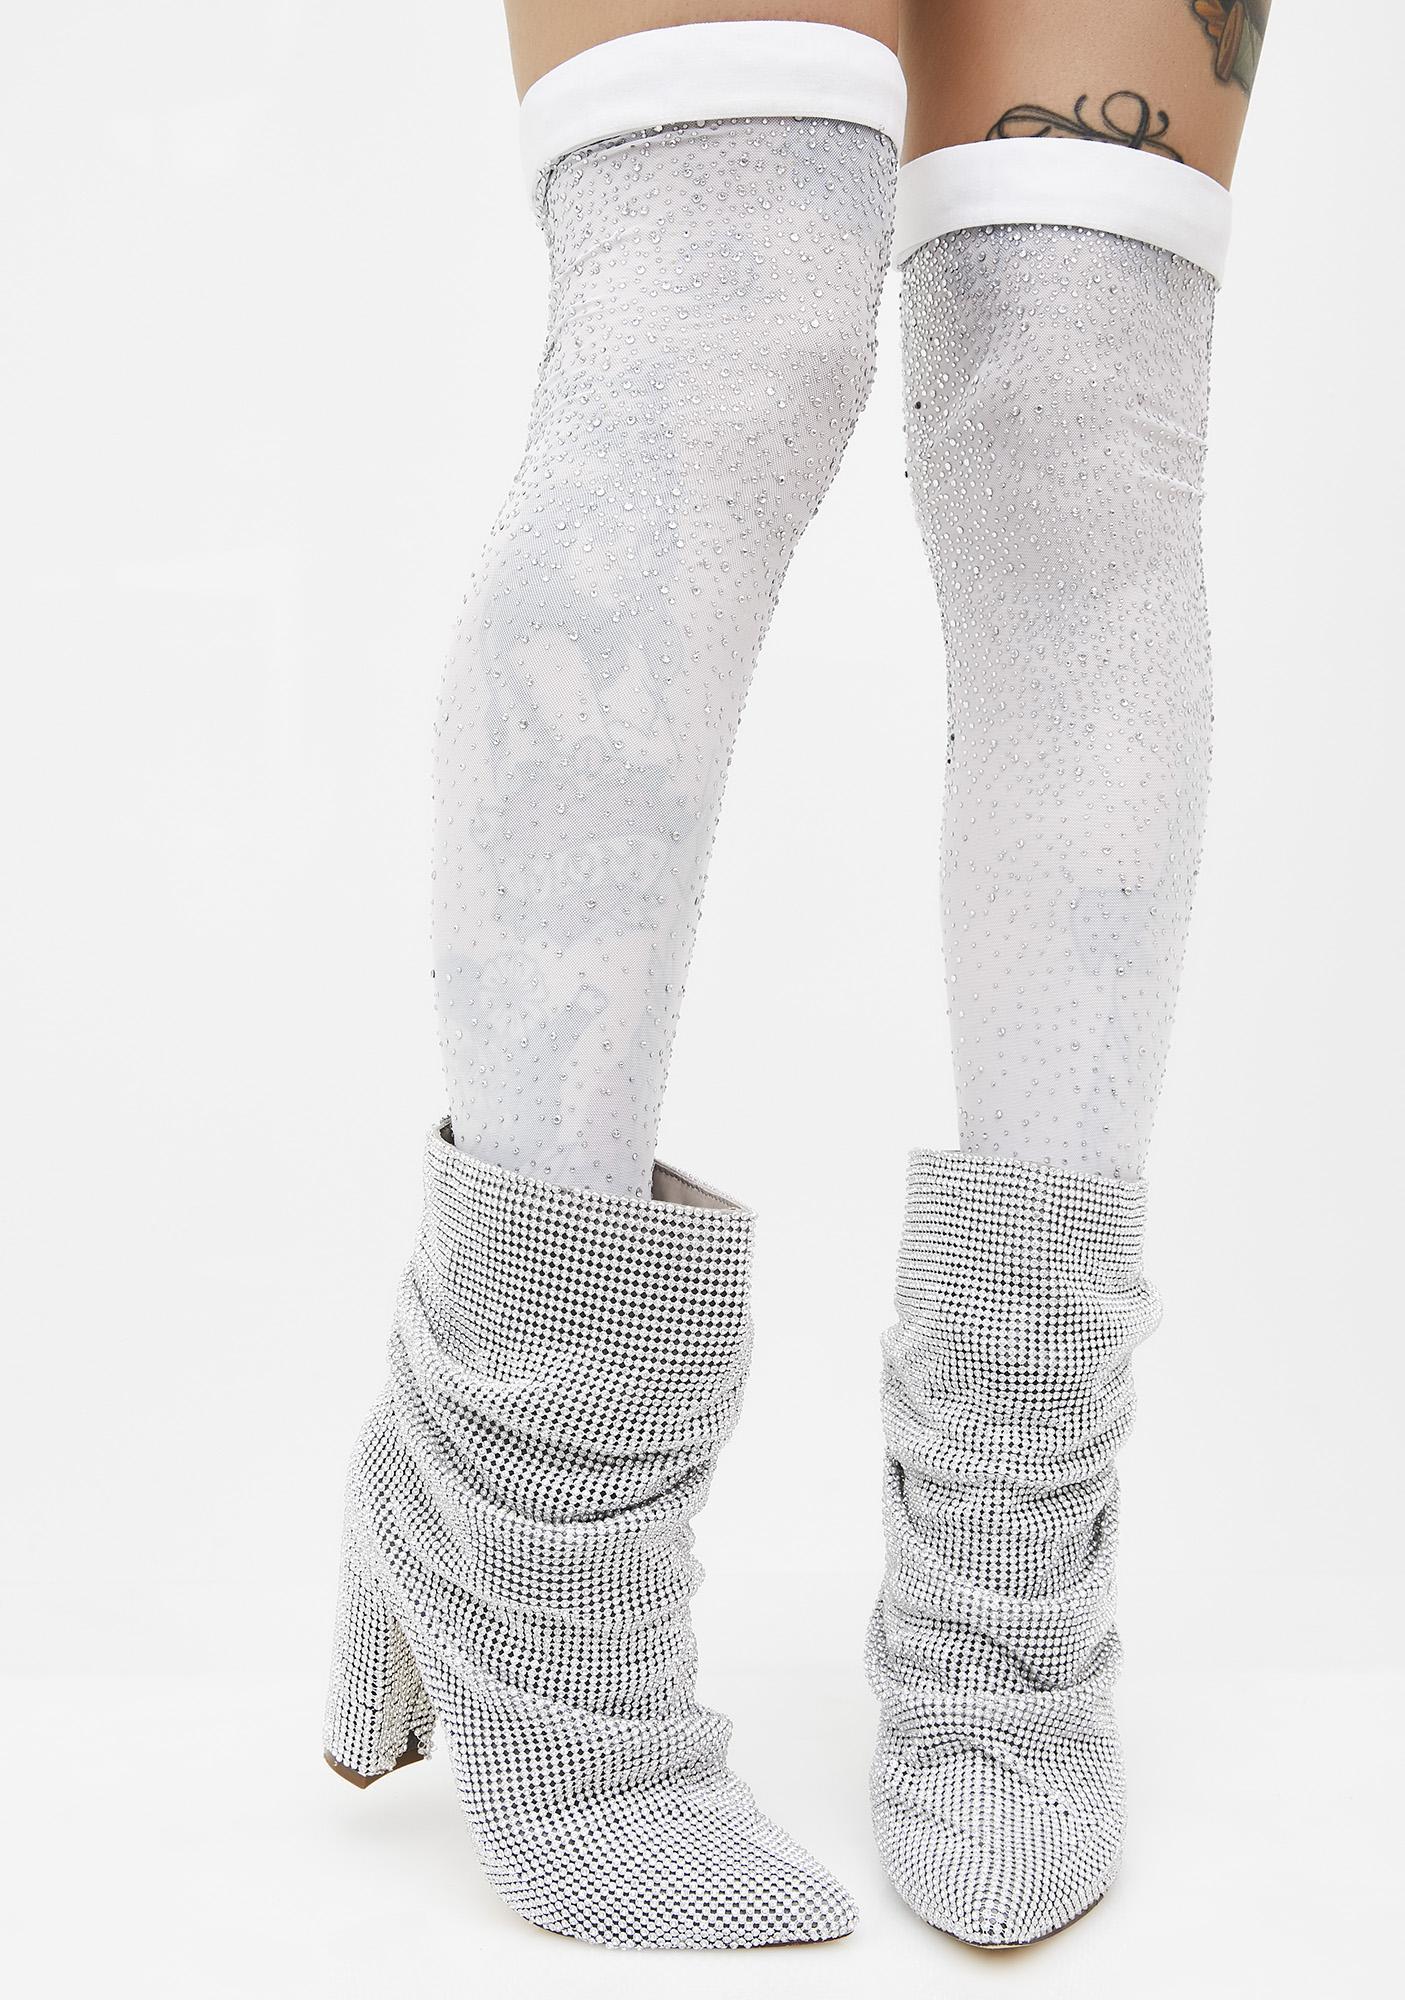 Kiki Riki So Frosty Thigh High Socks